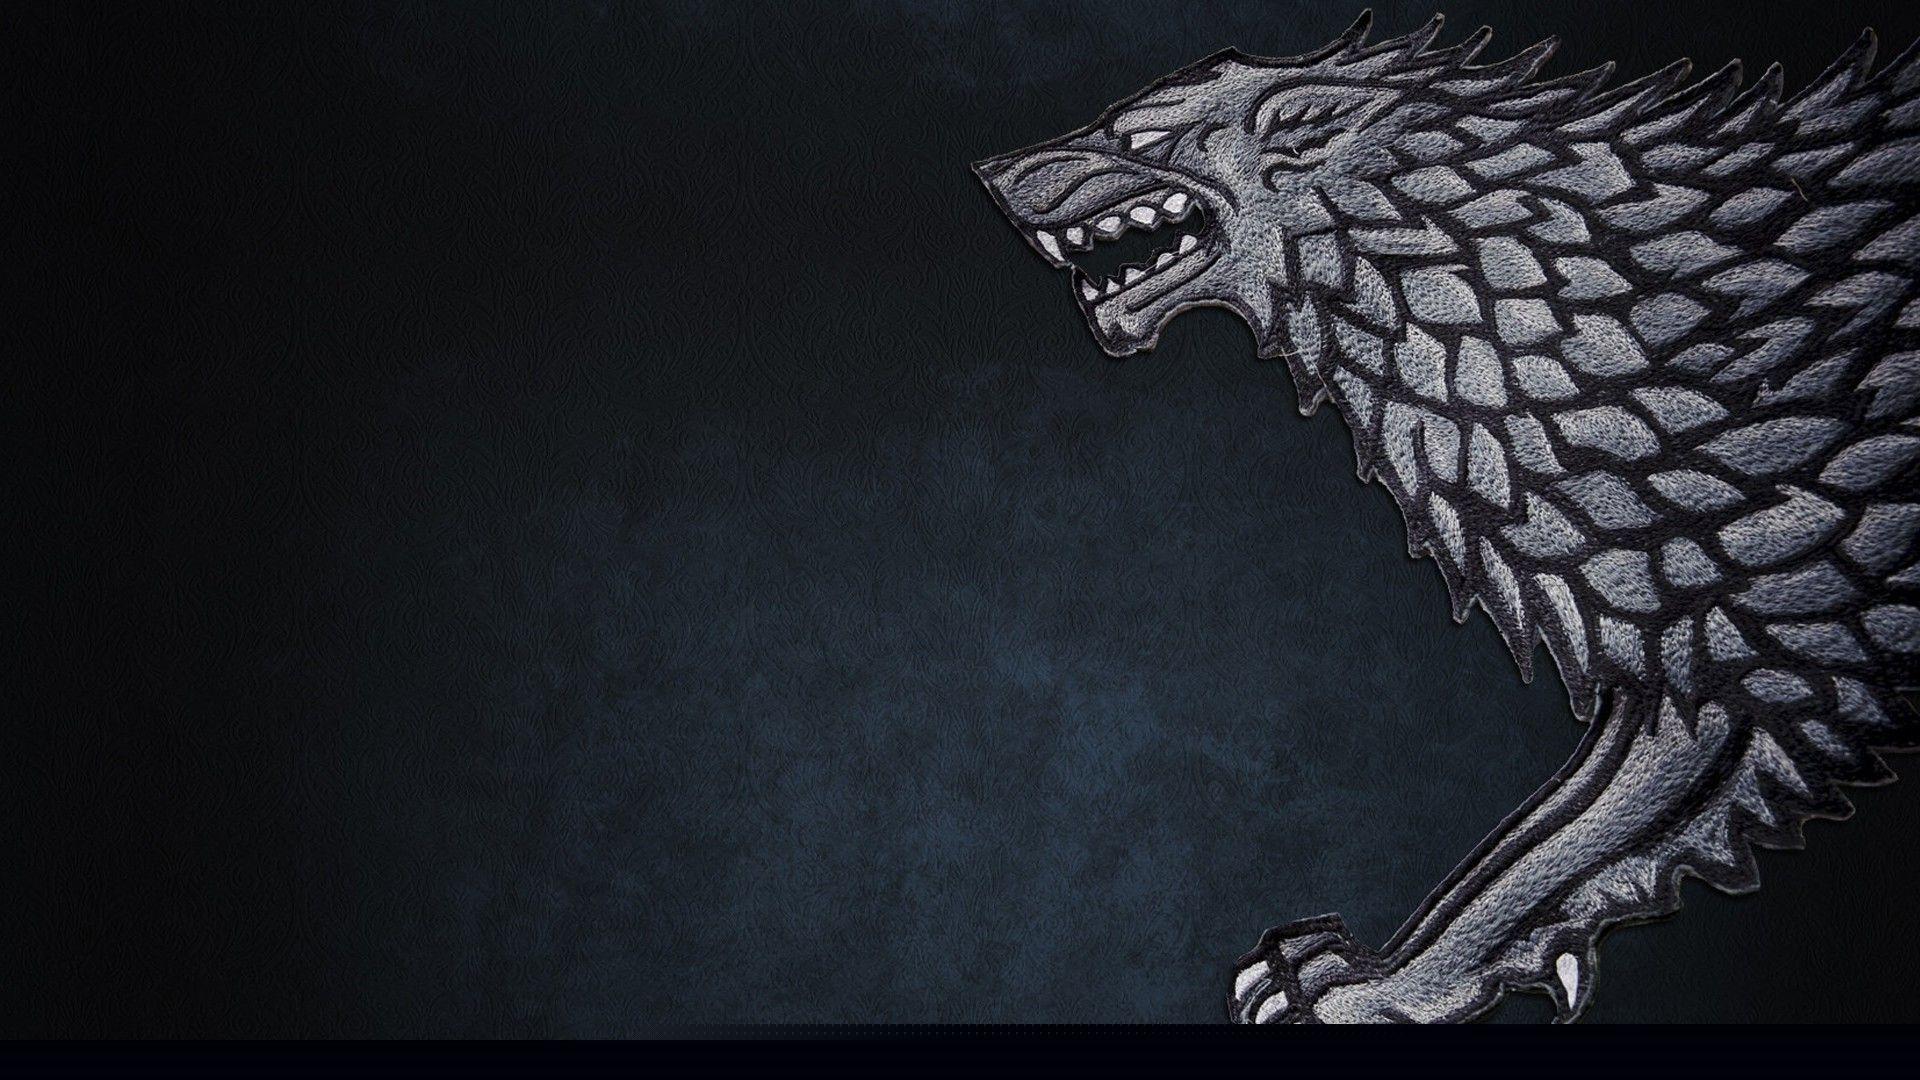 33 Game Of Thrones Sigils Wallpapers Wallpaperboat